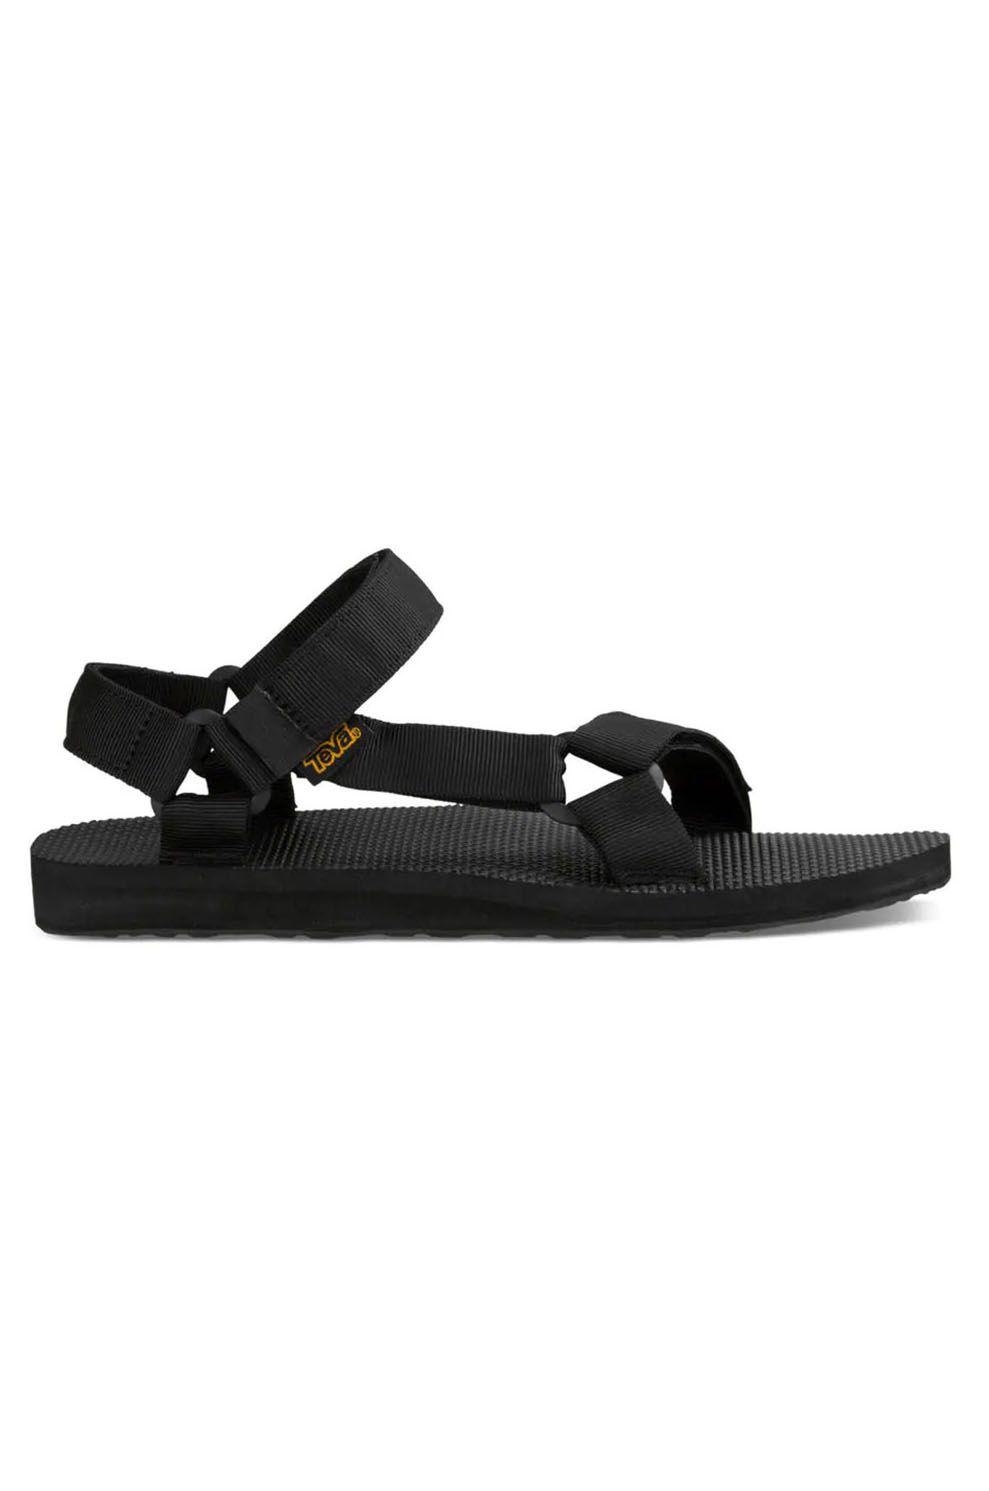 Teva Sandals ORIGINAL UNIVERSAL Black